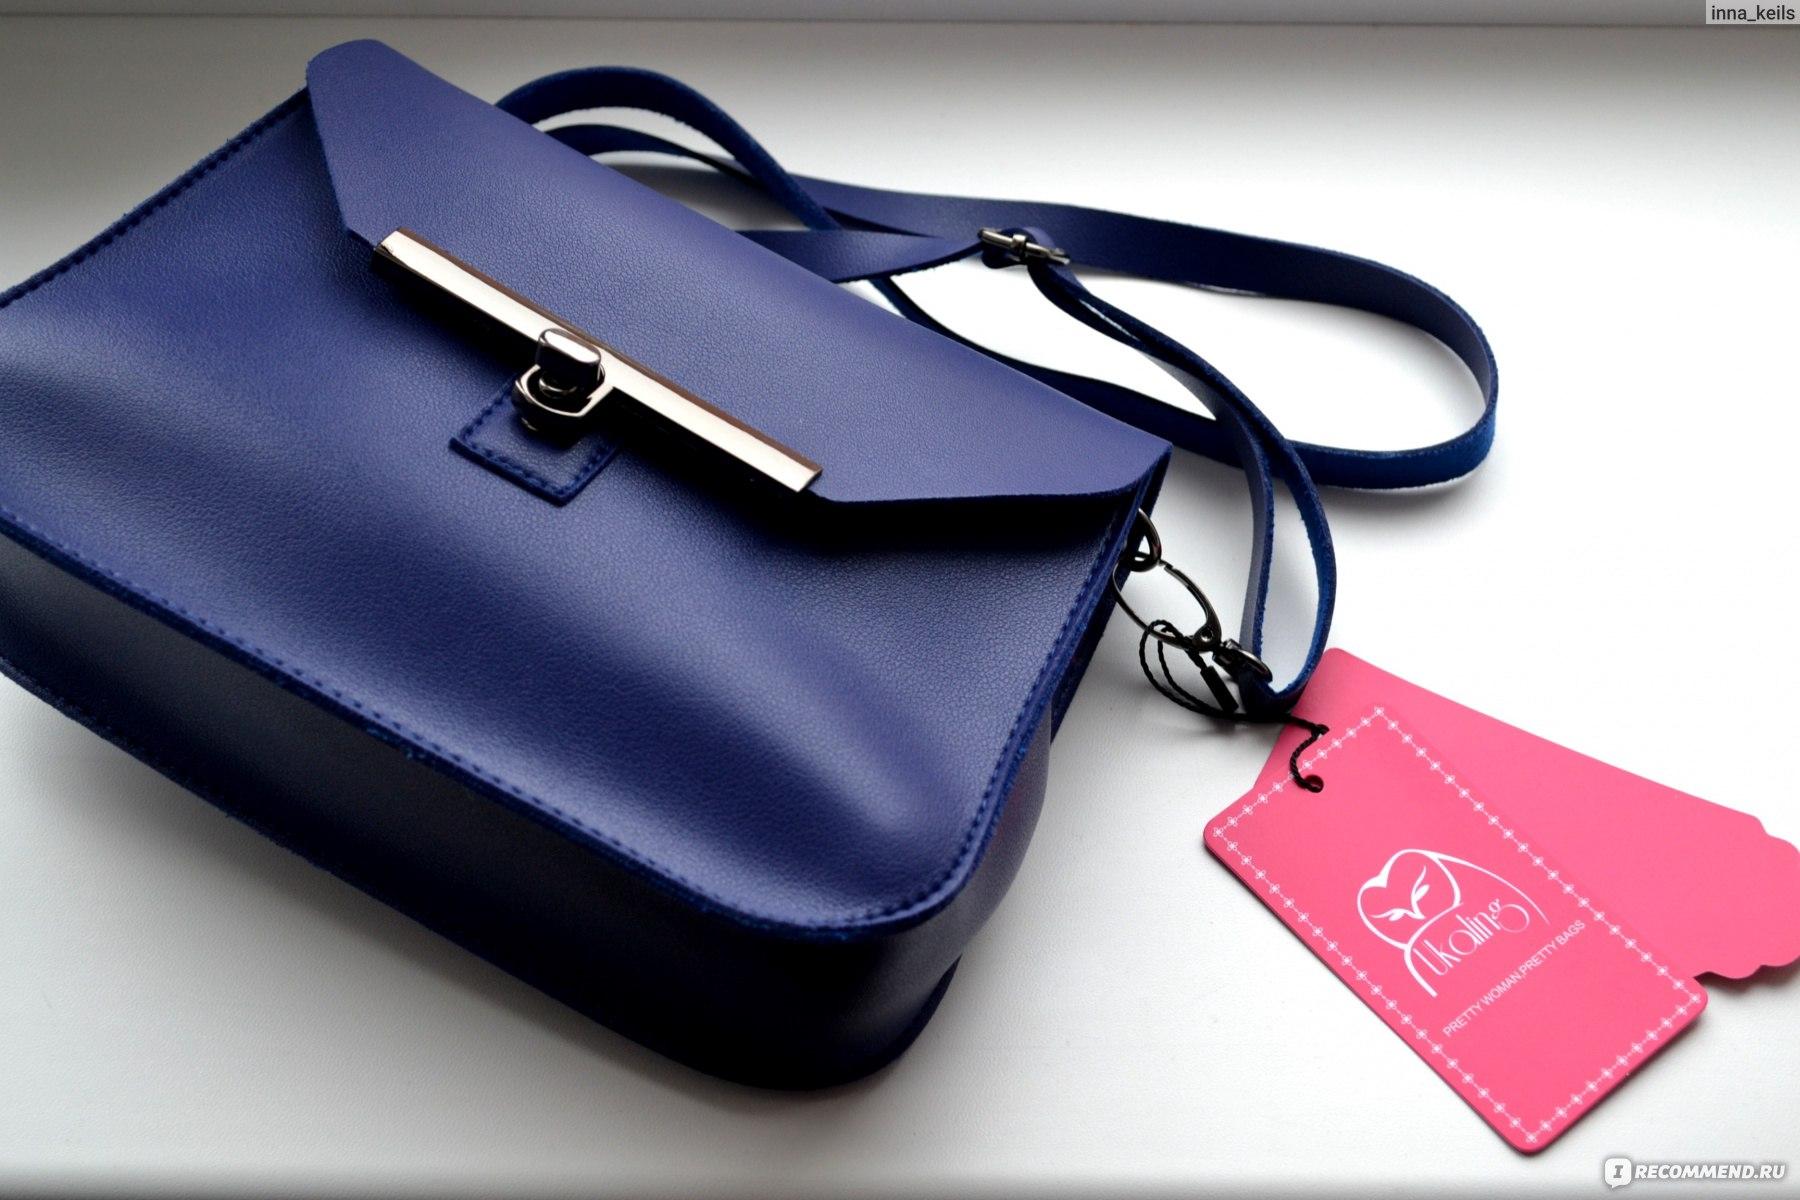 1adfb27dab97 Сумка Женская Aliexpress UKQLING Small Women Messenger Bags Flap Handbag  Soft PU Women Bag Lady PU